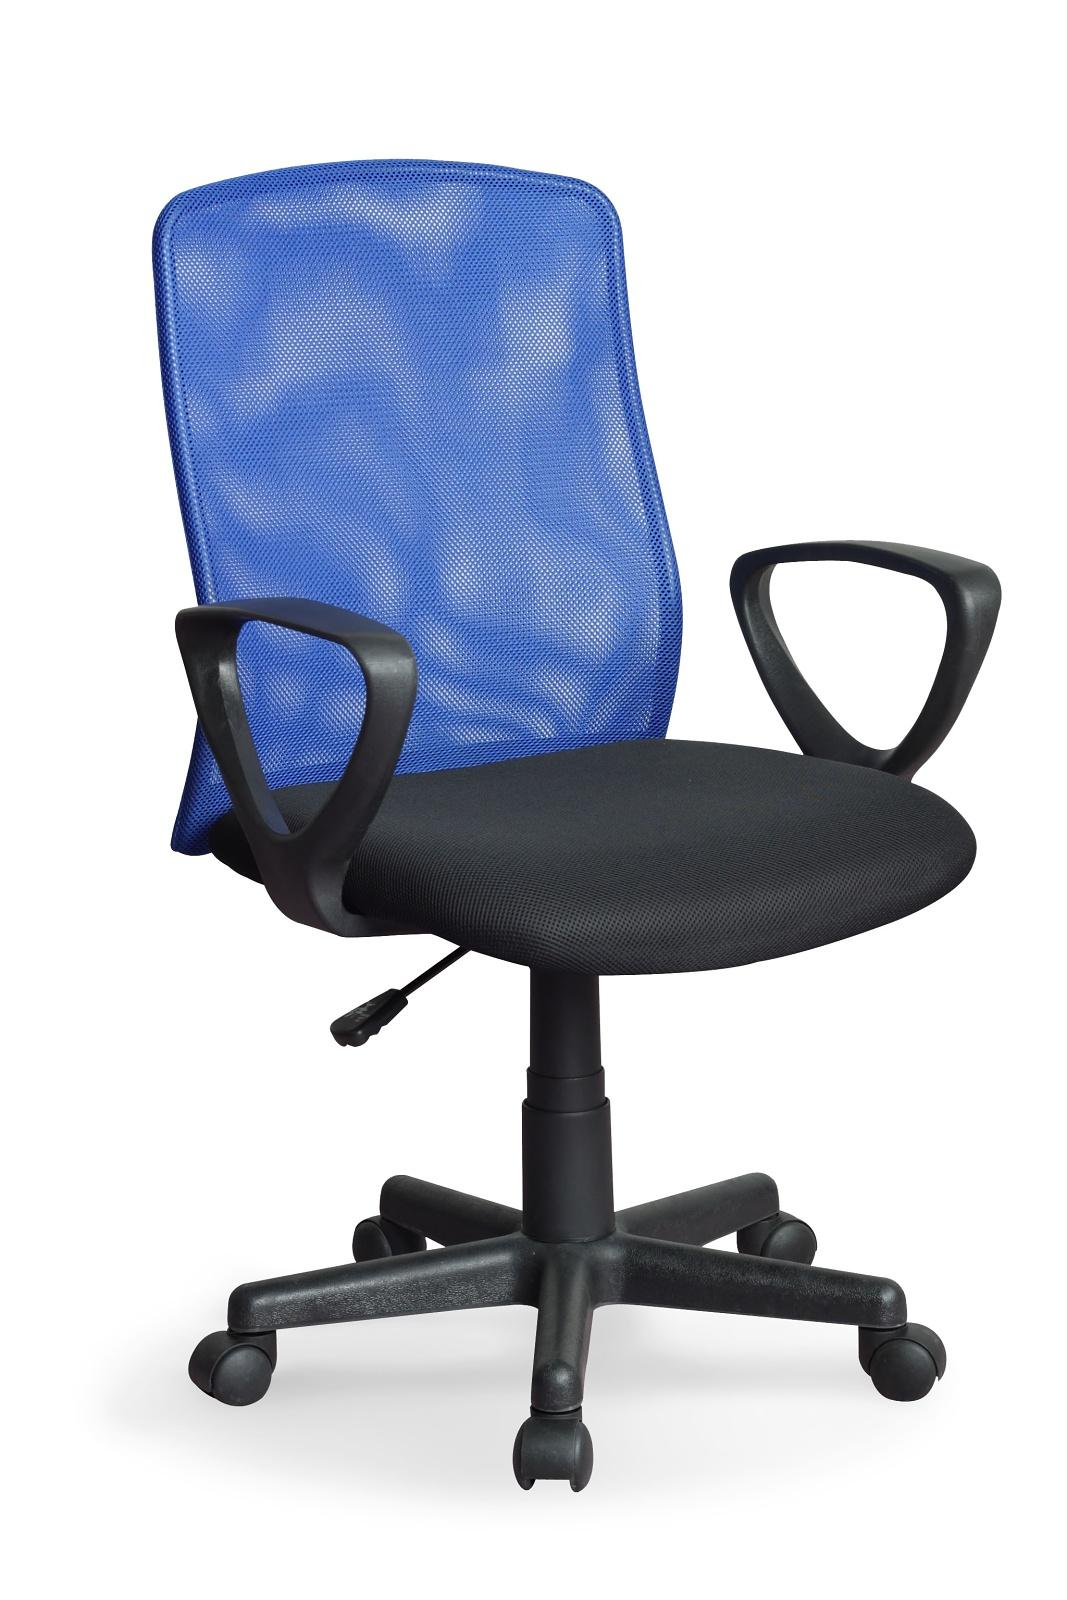 Kancelářská židle - Halmar - Alex černá + modrá